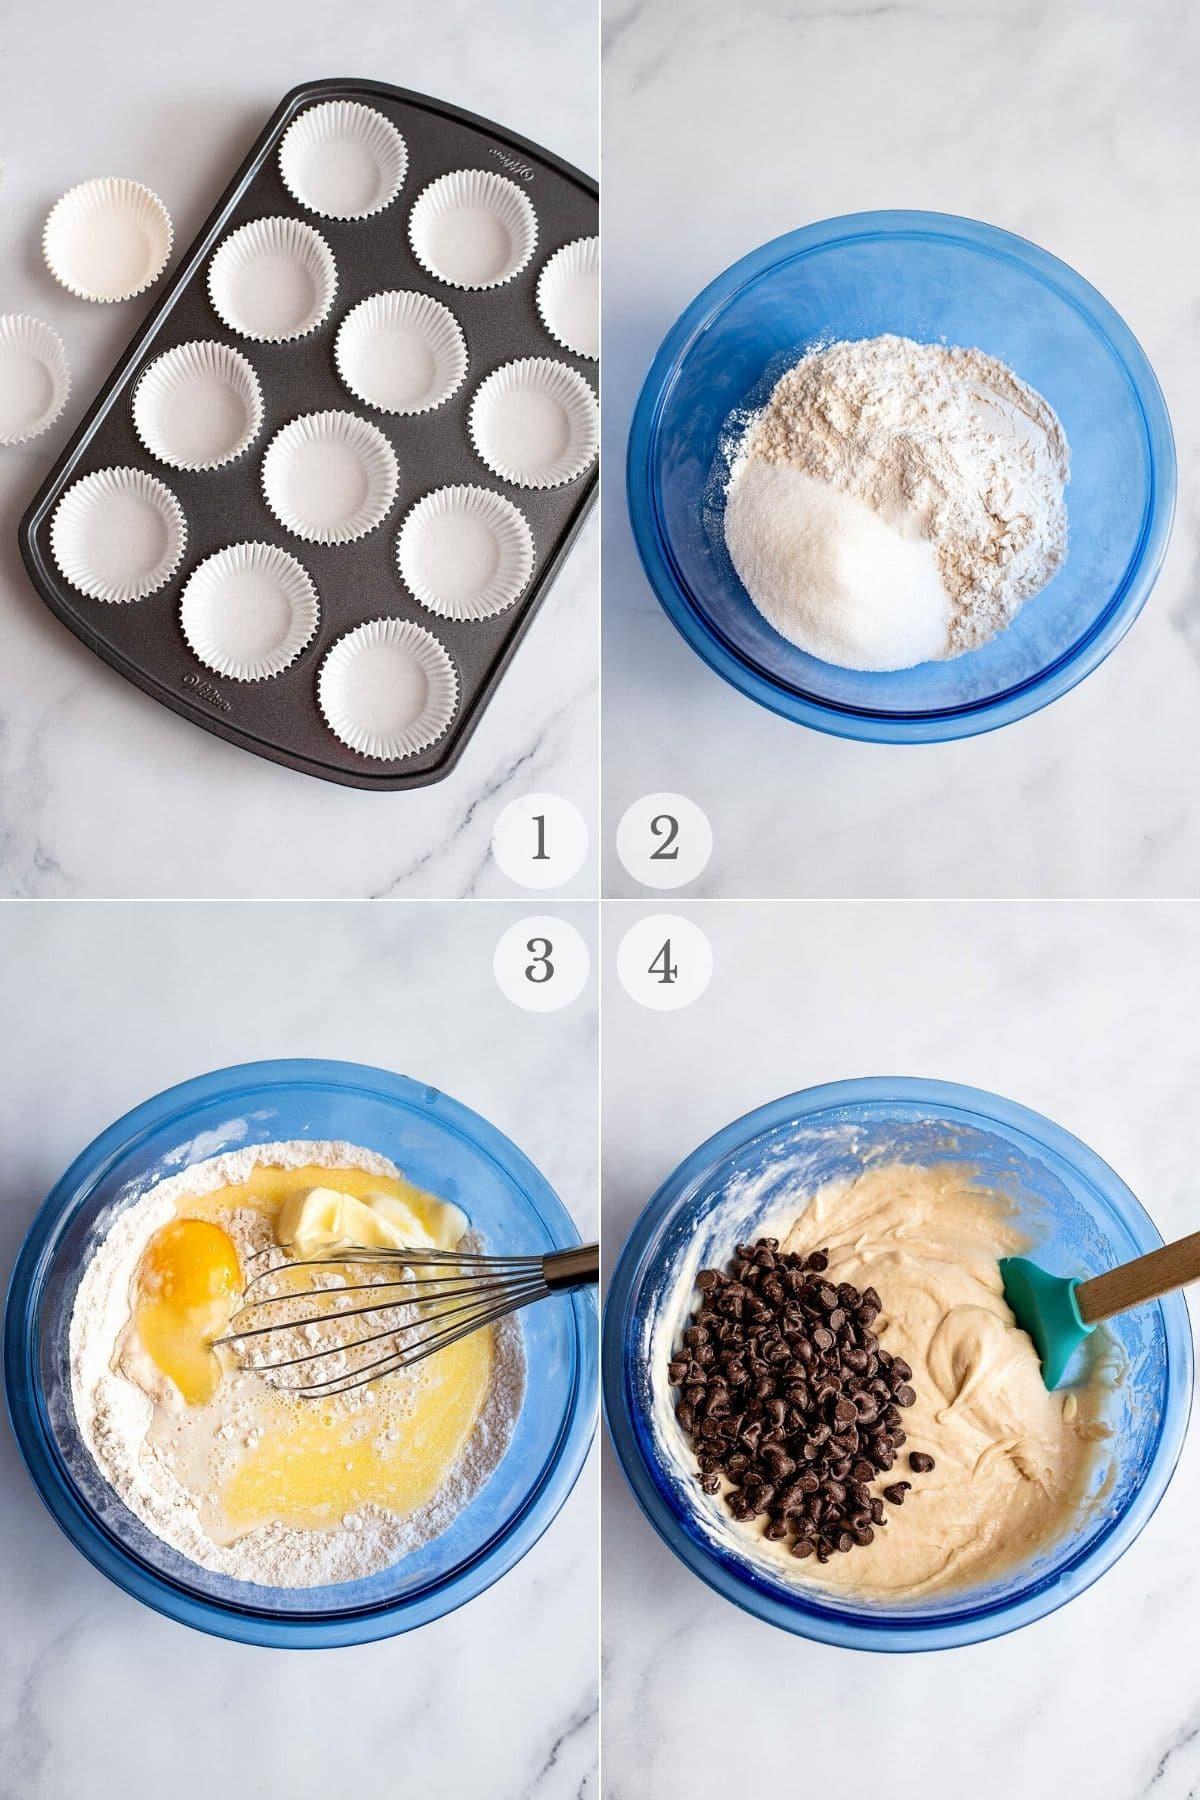 chocolate chip muffins recipe steps 1-4